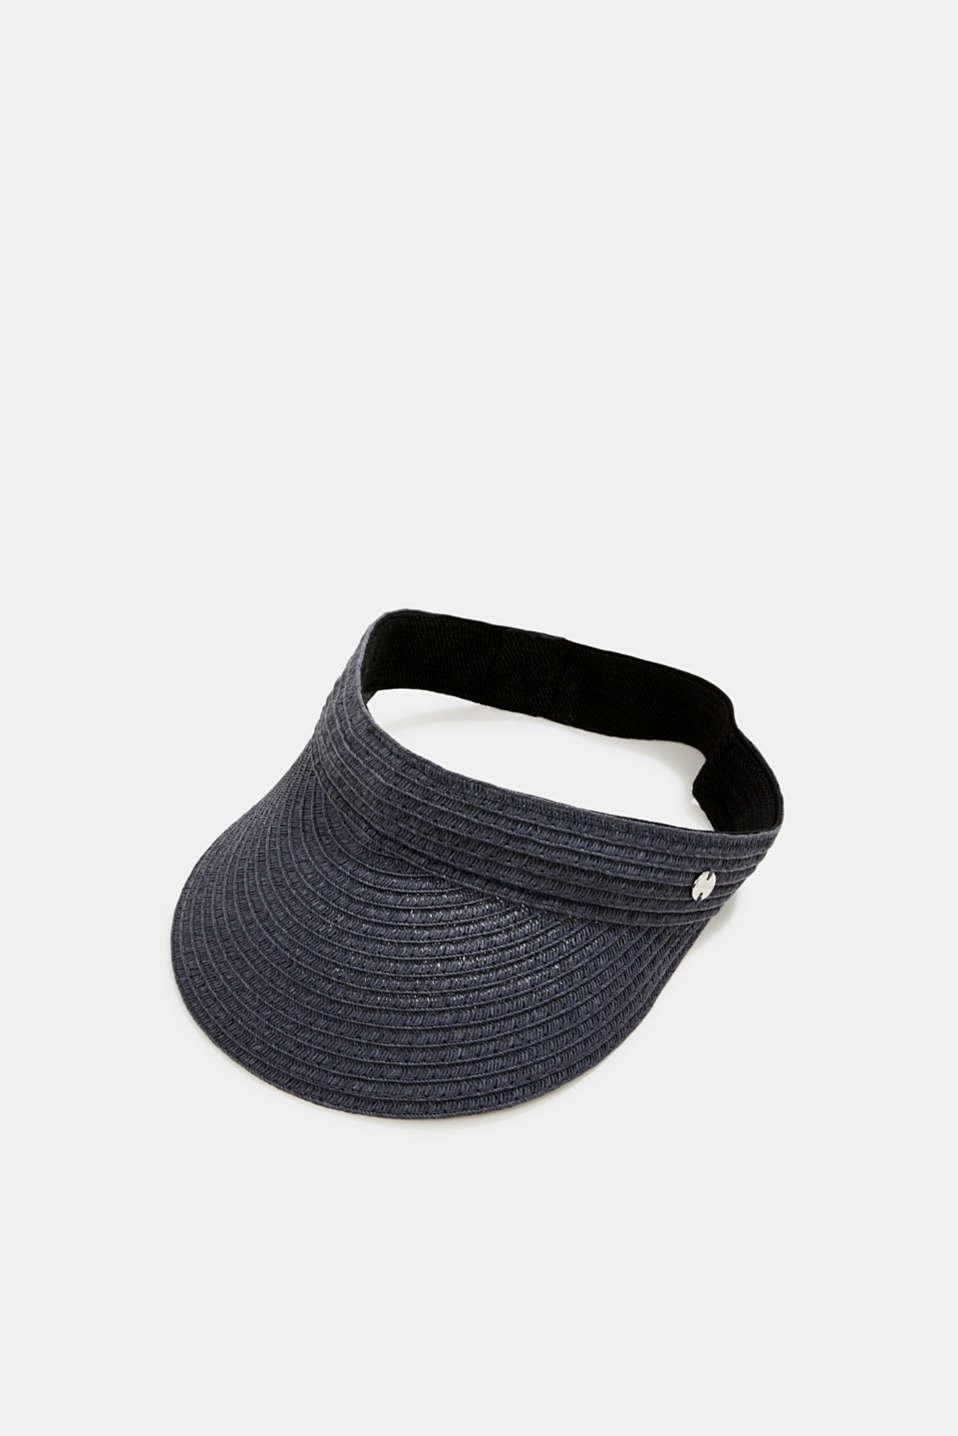 Hand-made straw visor cap, BLUE, detail image number 0